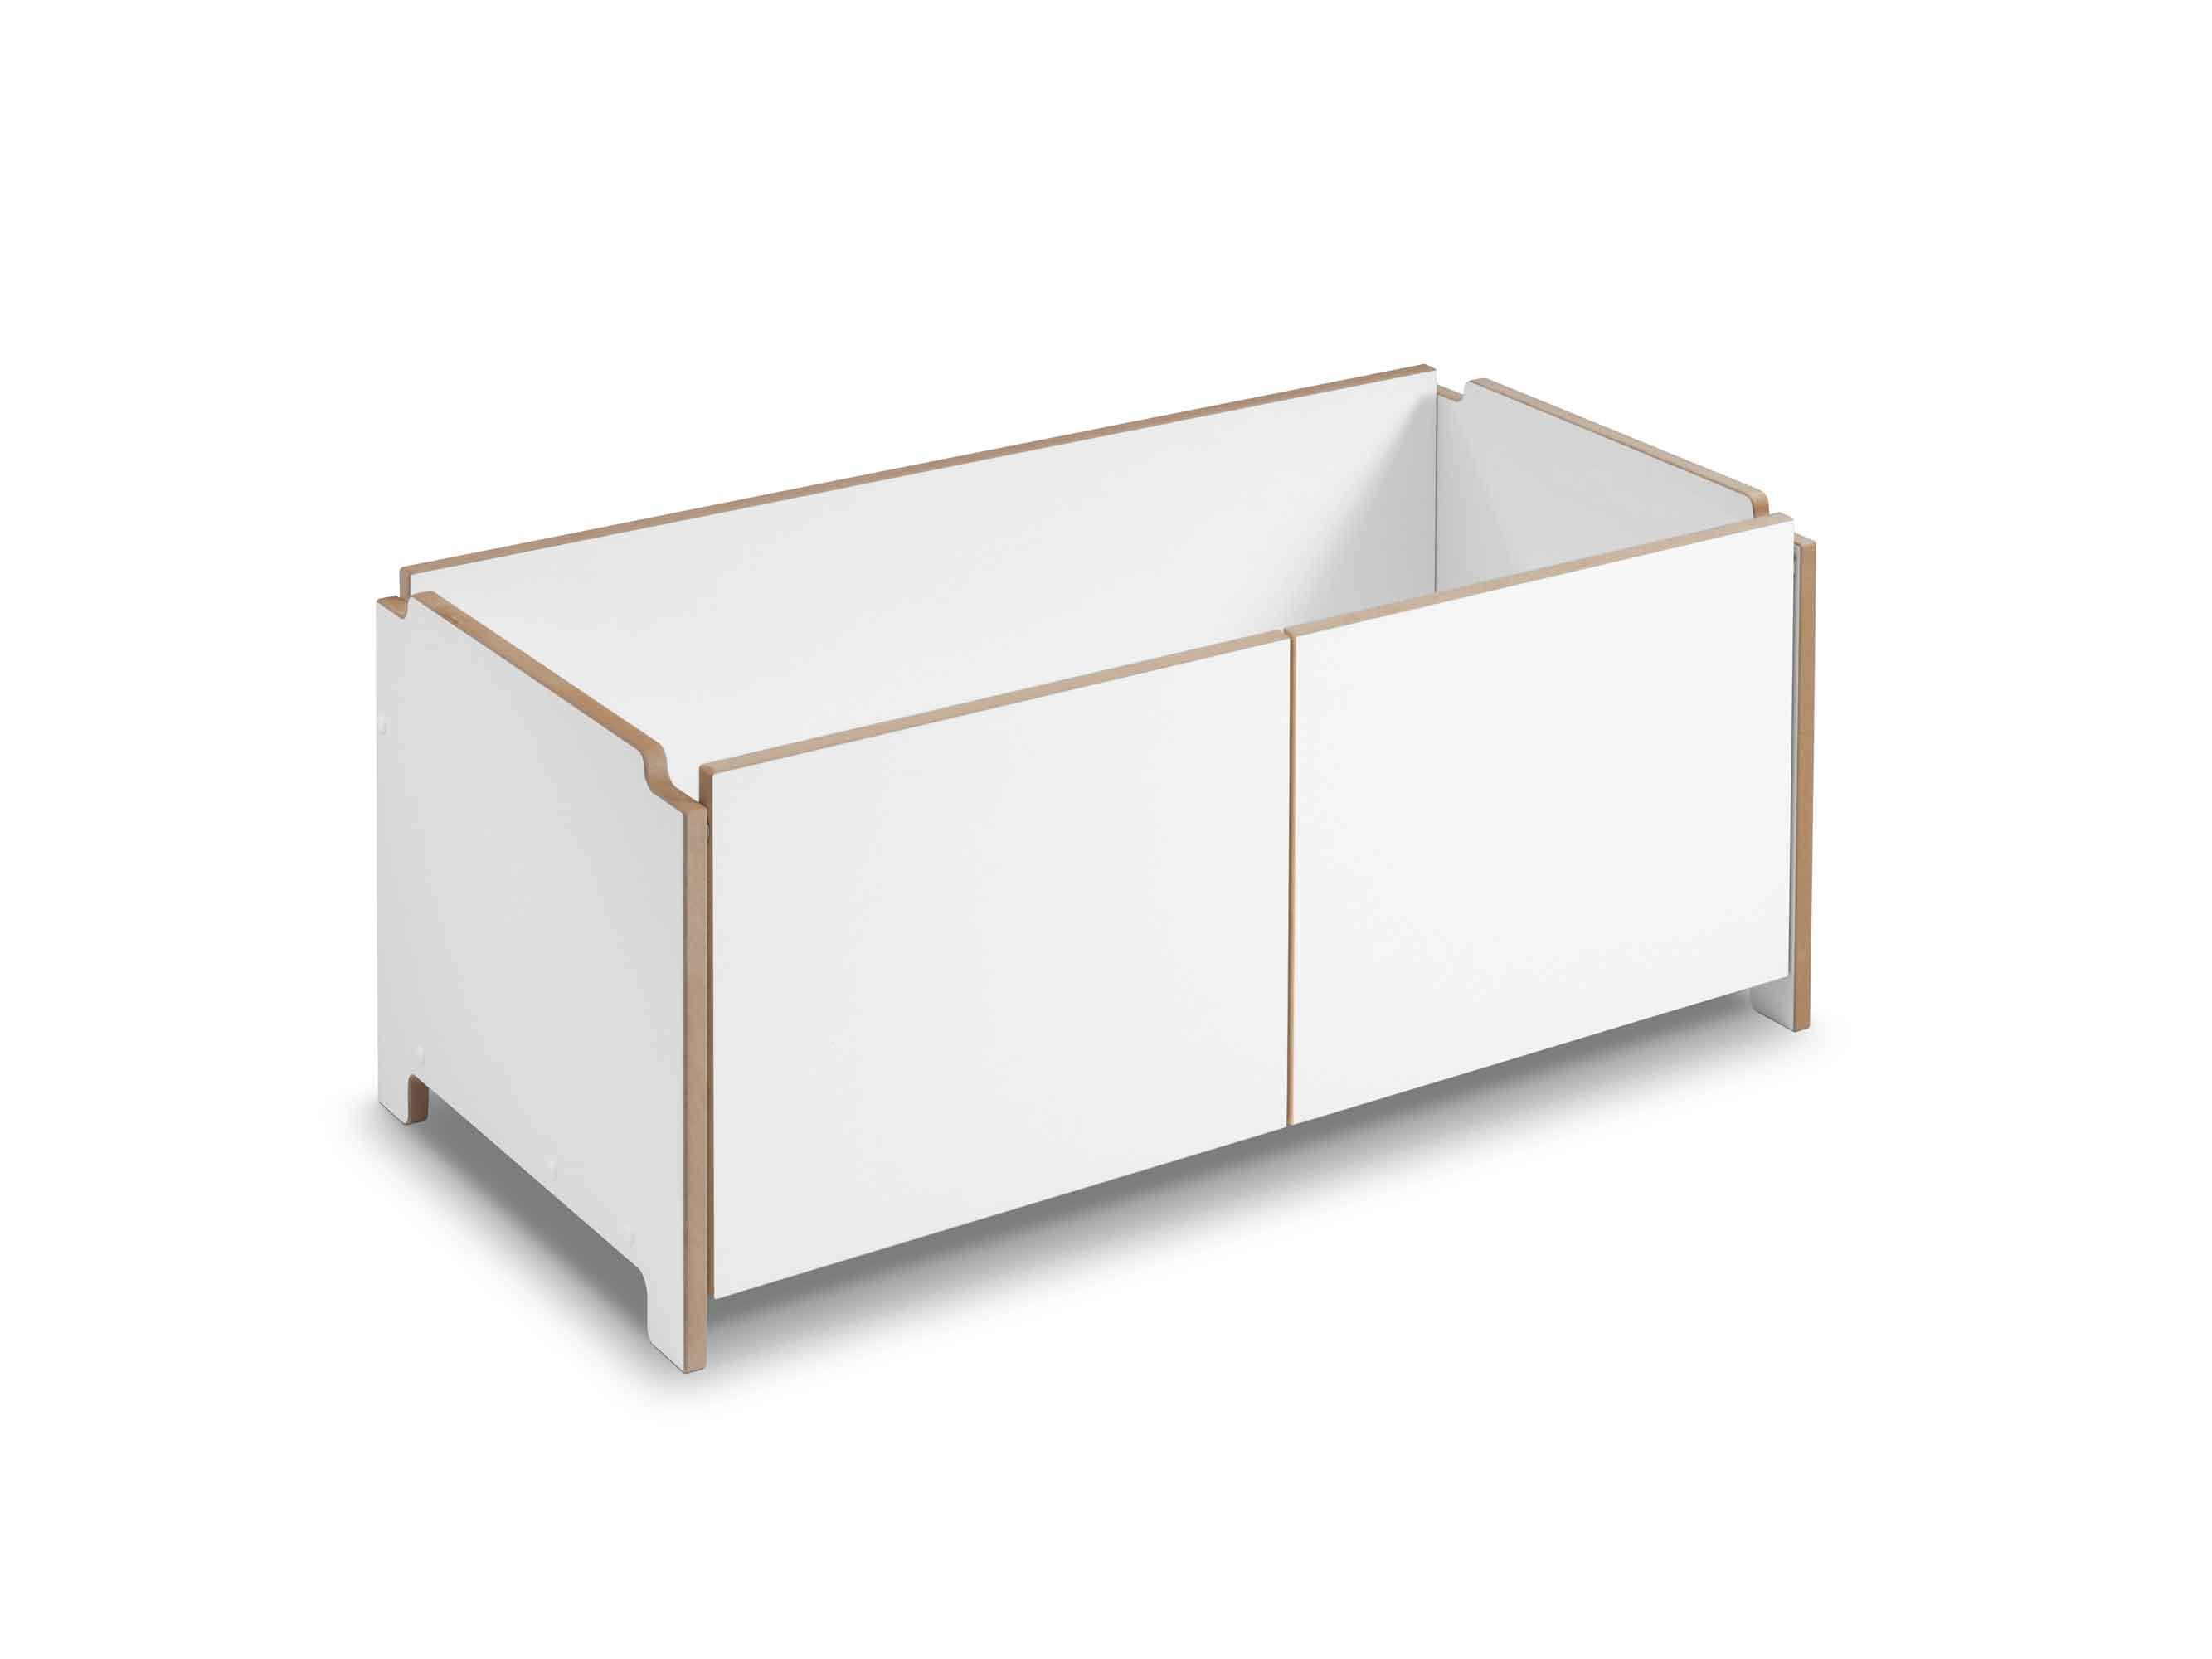 regal 35 tief perfect regal cm tief design fotos with regal 35 tief cool regal cm breit finest. Black Bedroom Furniture Sets. Home Design Ideas